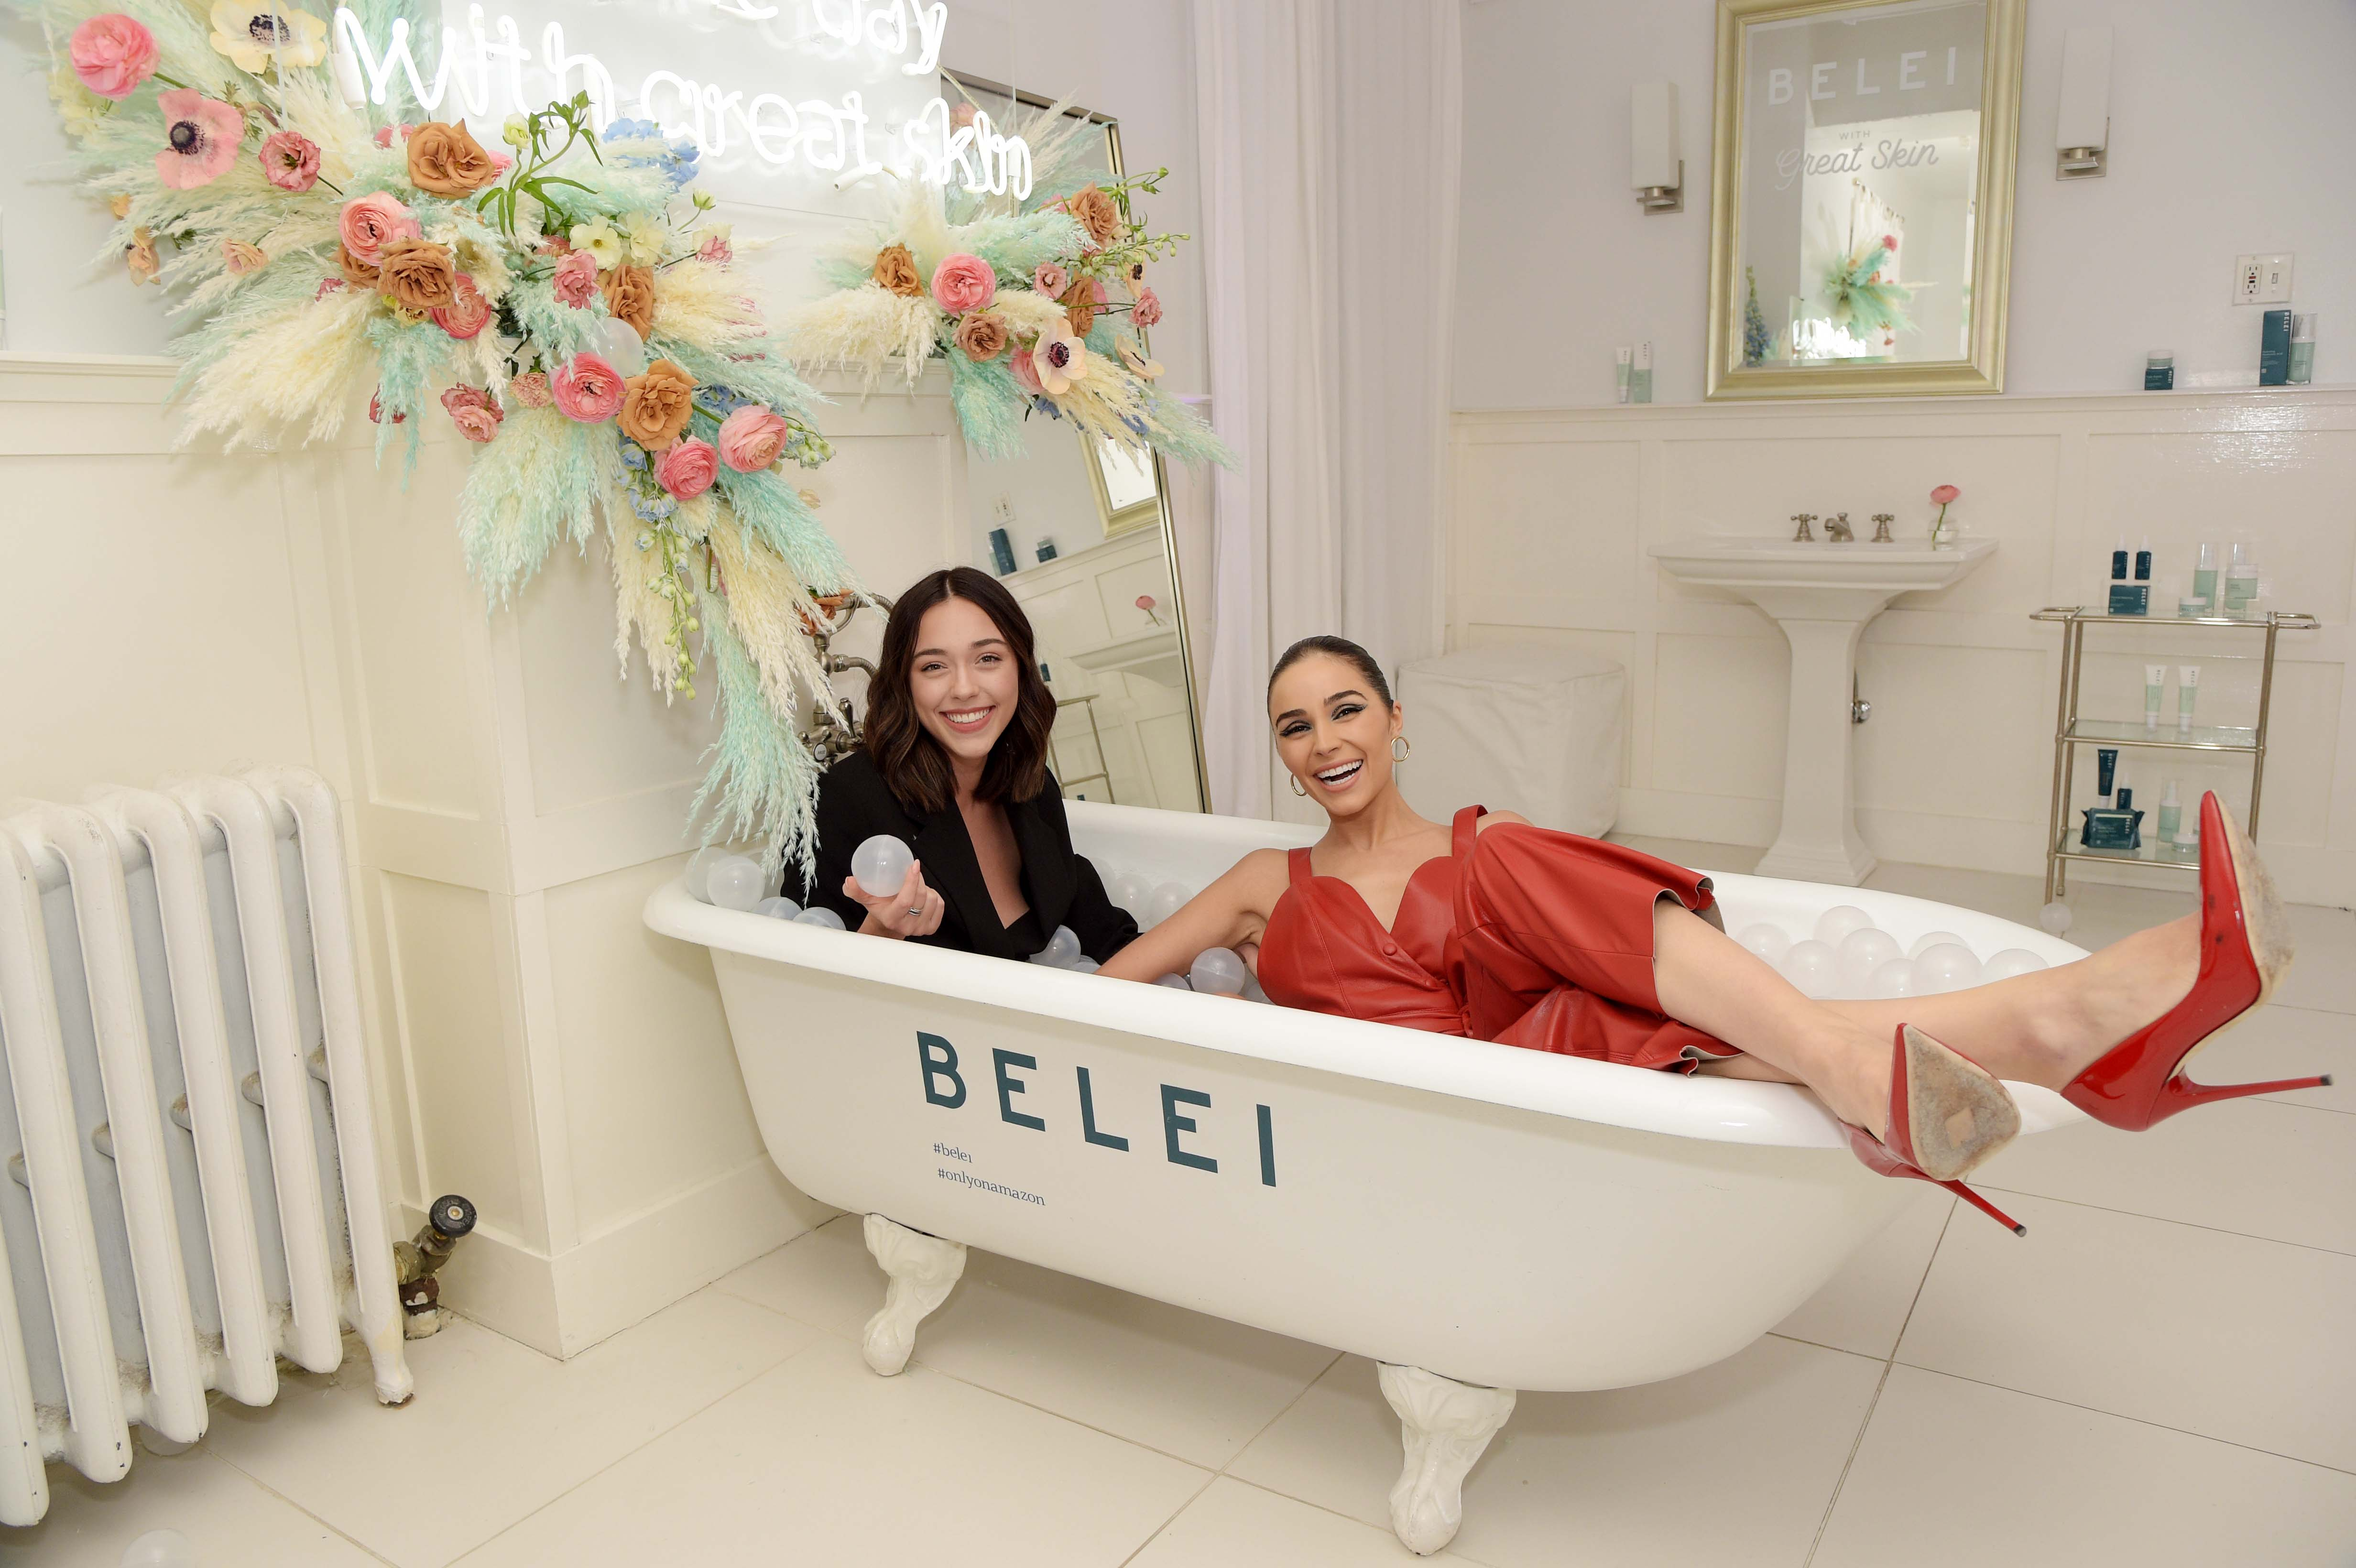 Olivia Culpo attending Amazon's Belei Skincare Line Launch